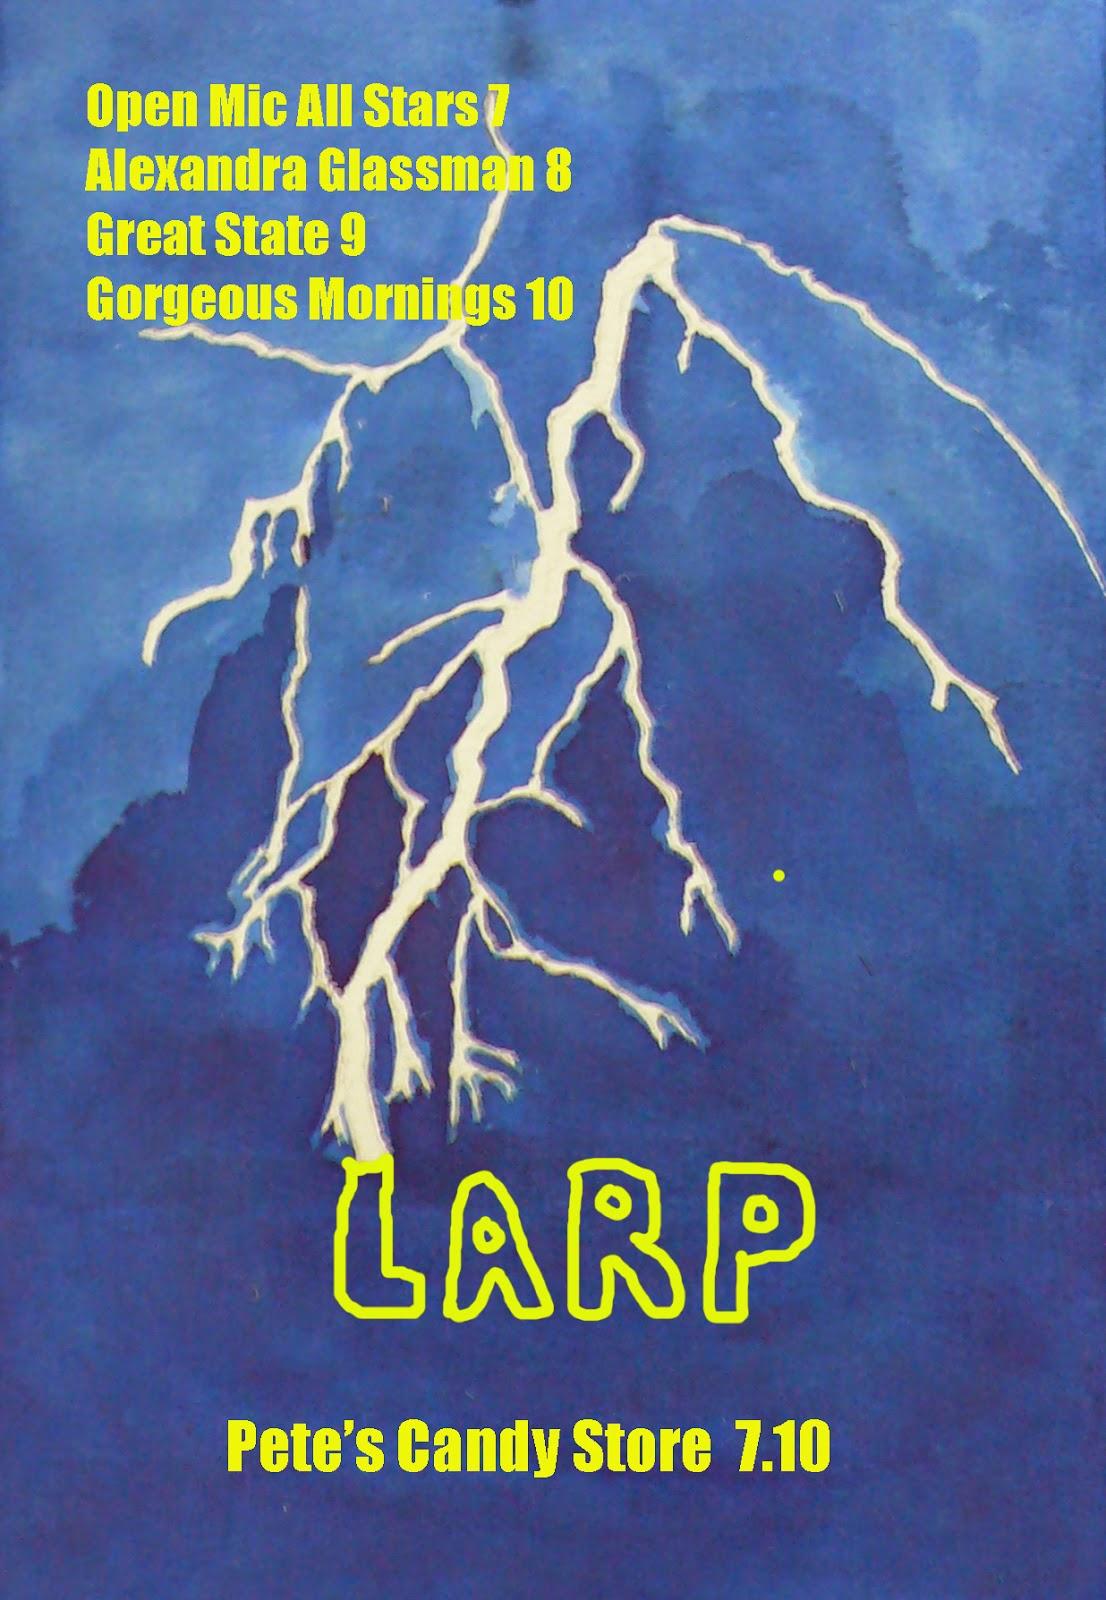 http://larp.bandcamp.com/album/larp-live-at-petes-2